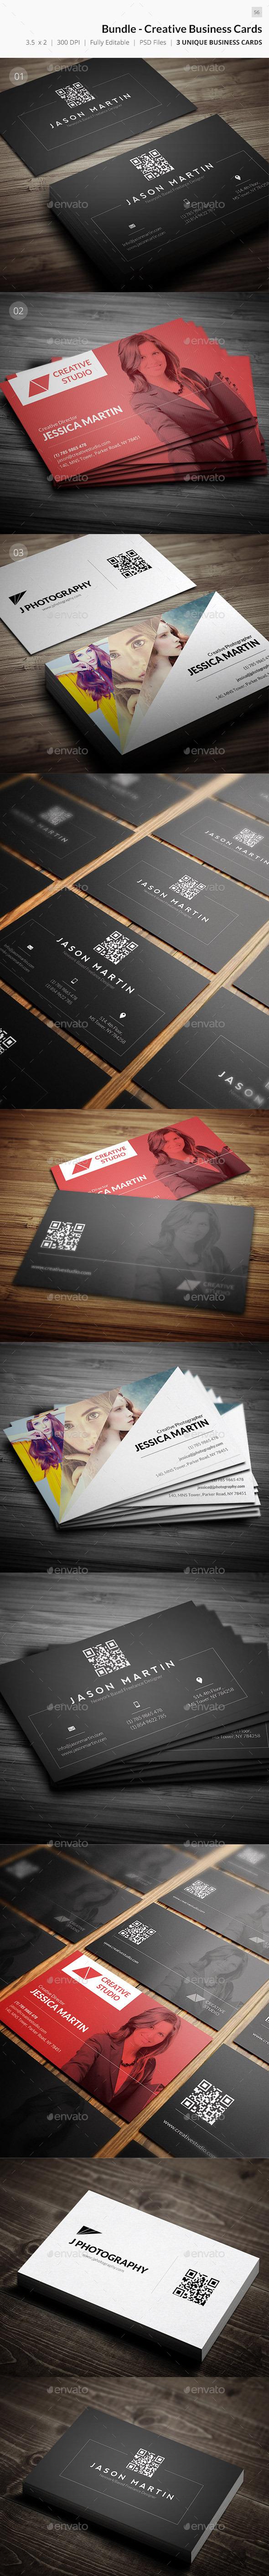 Bundle - Creative Business Card - 56 - Creative Business Cards